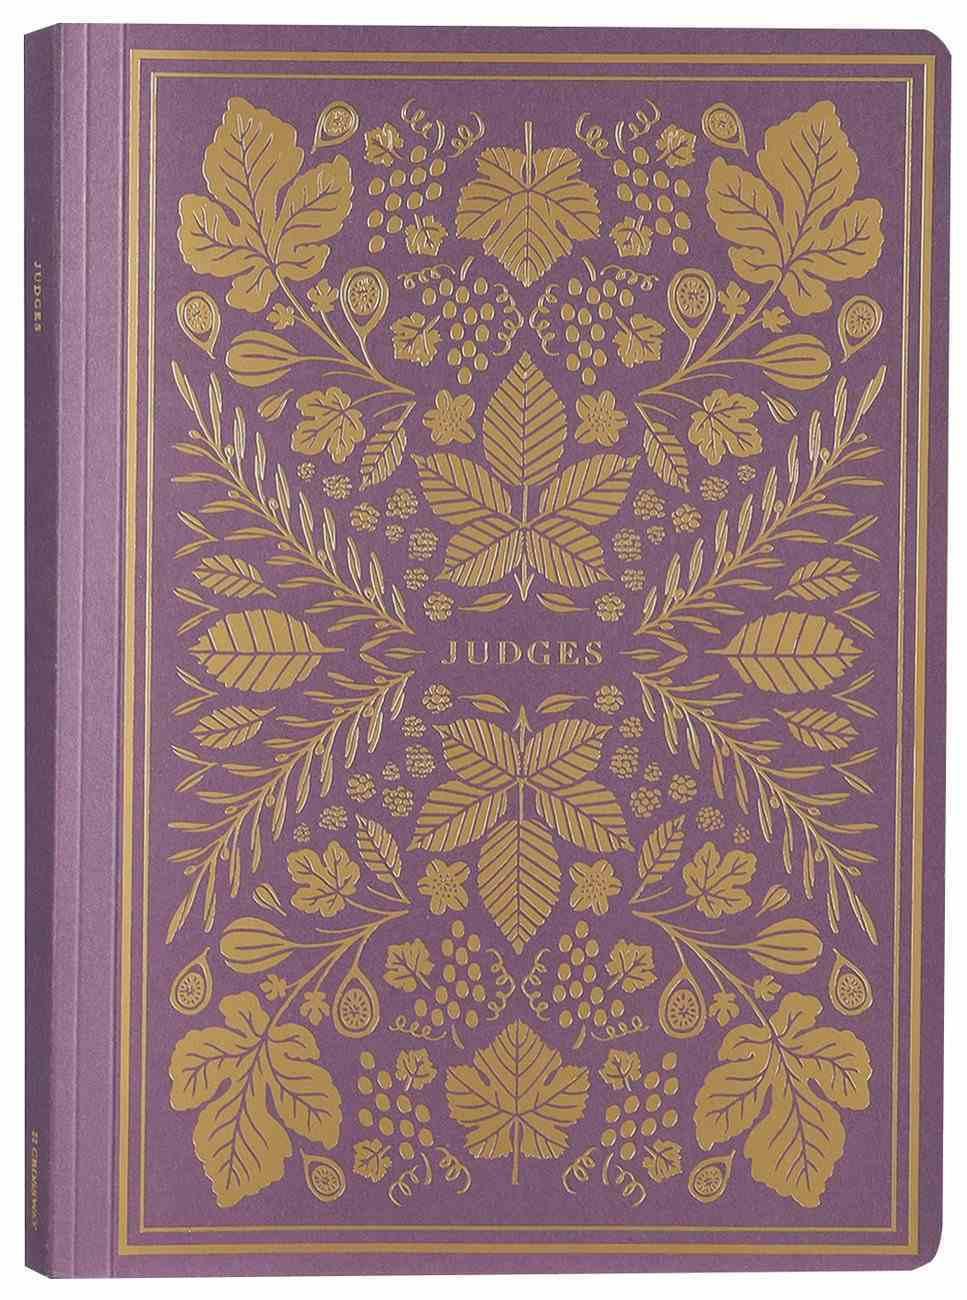 ESV Illuminated Scripture Journal Judges (Black Letter Edition) Paperback